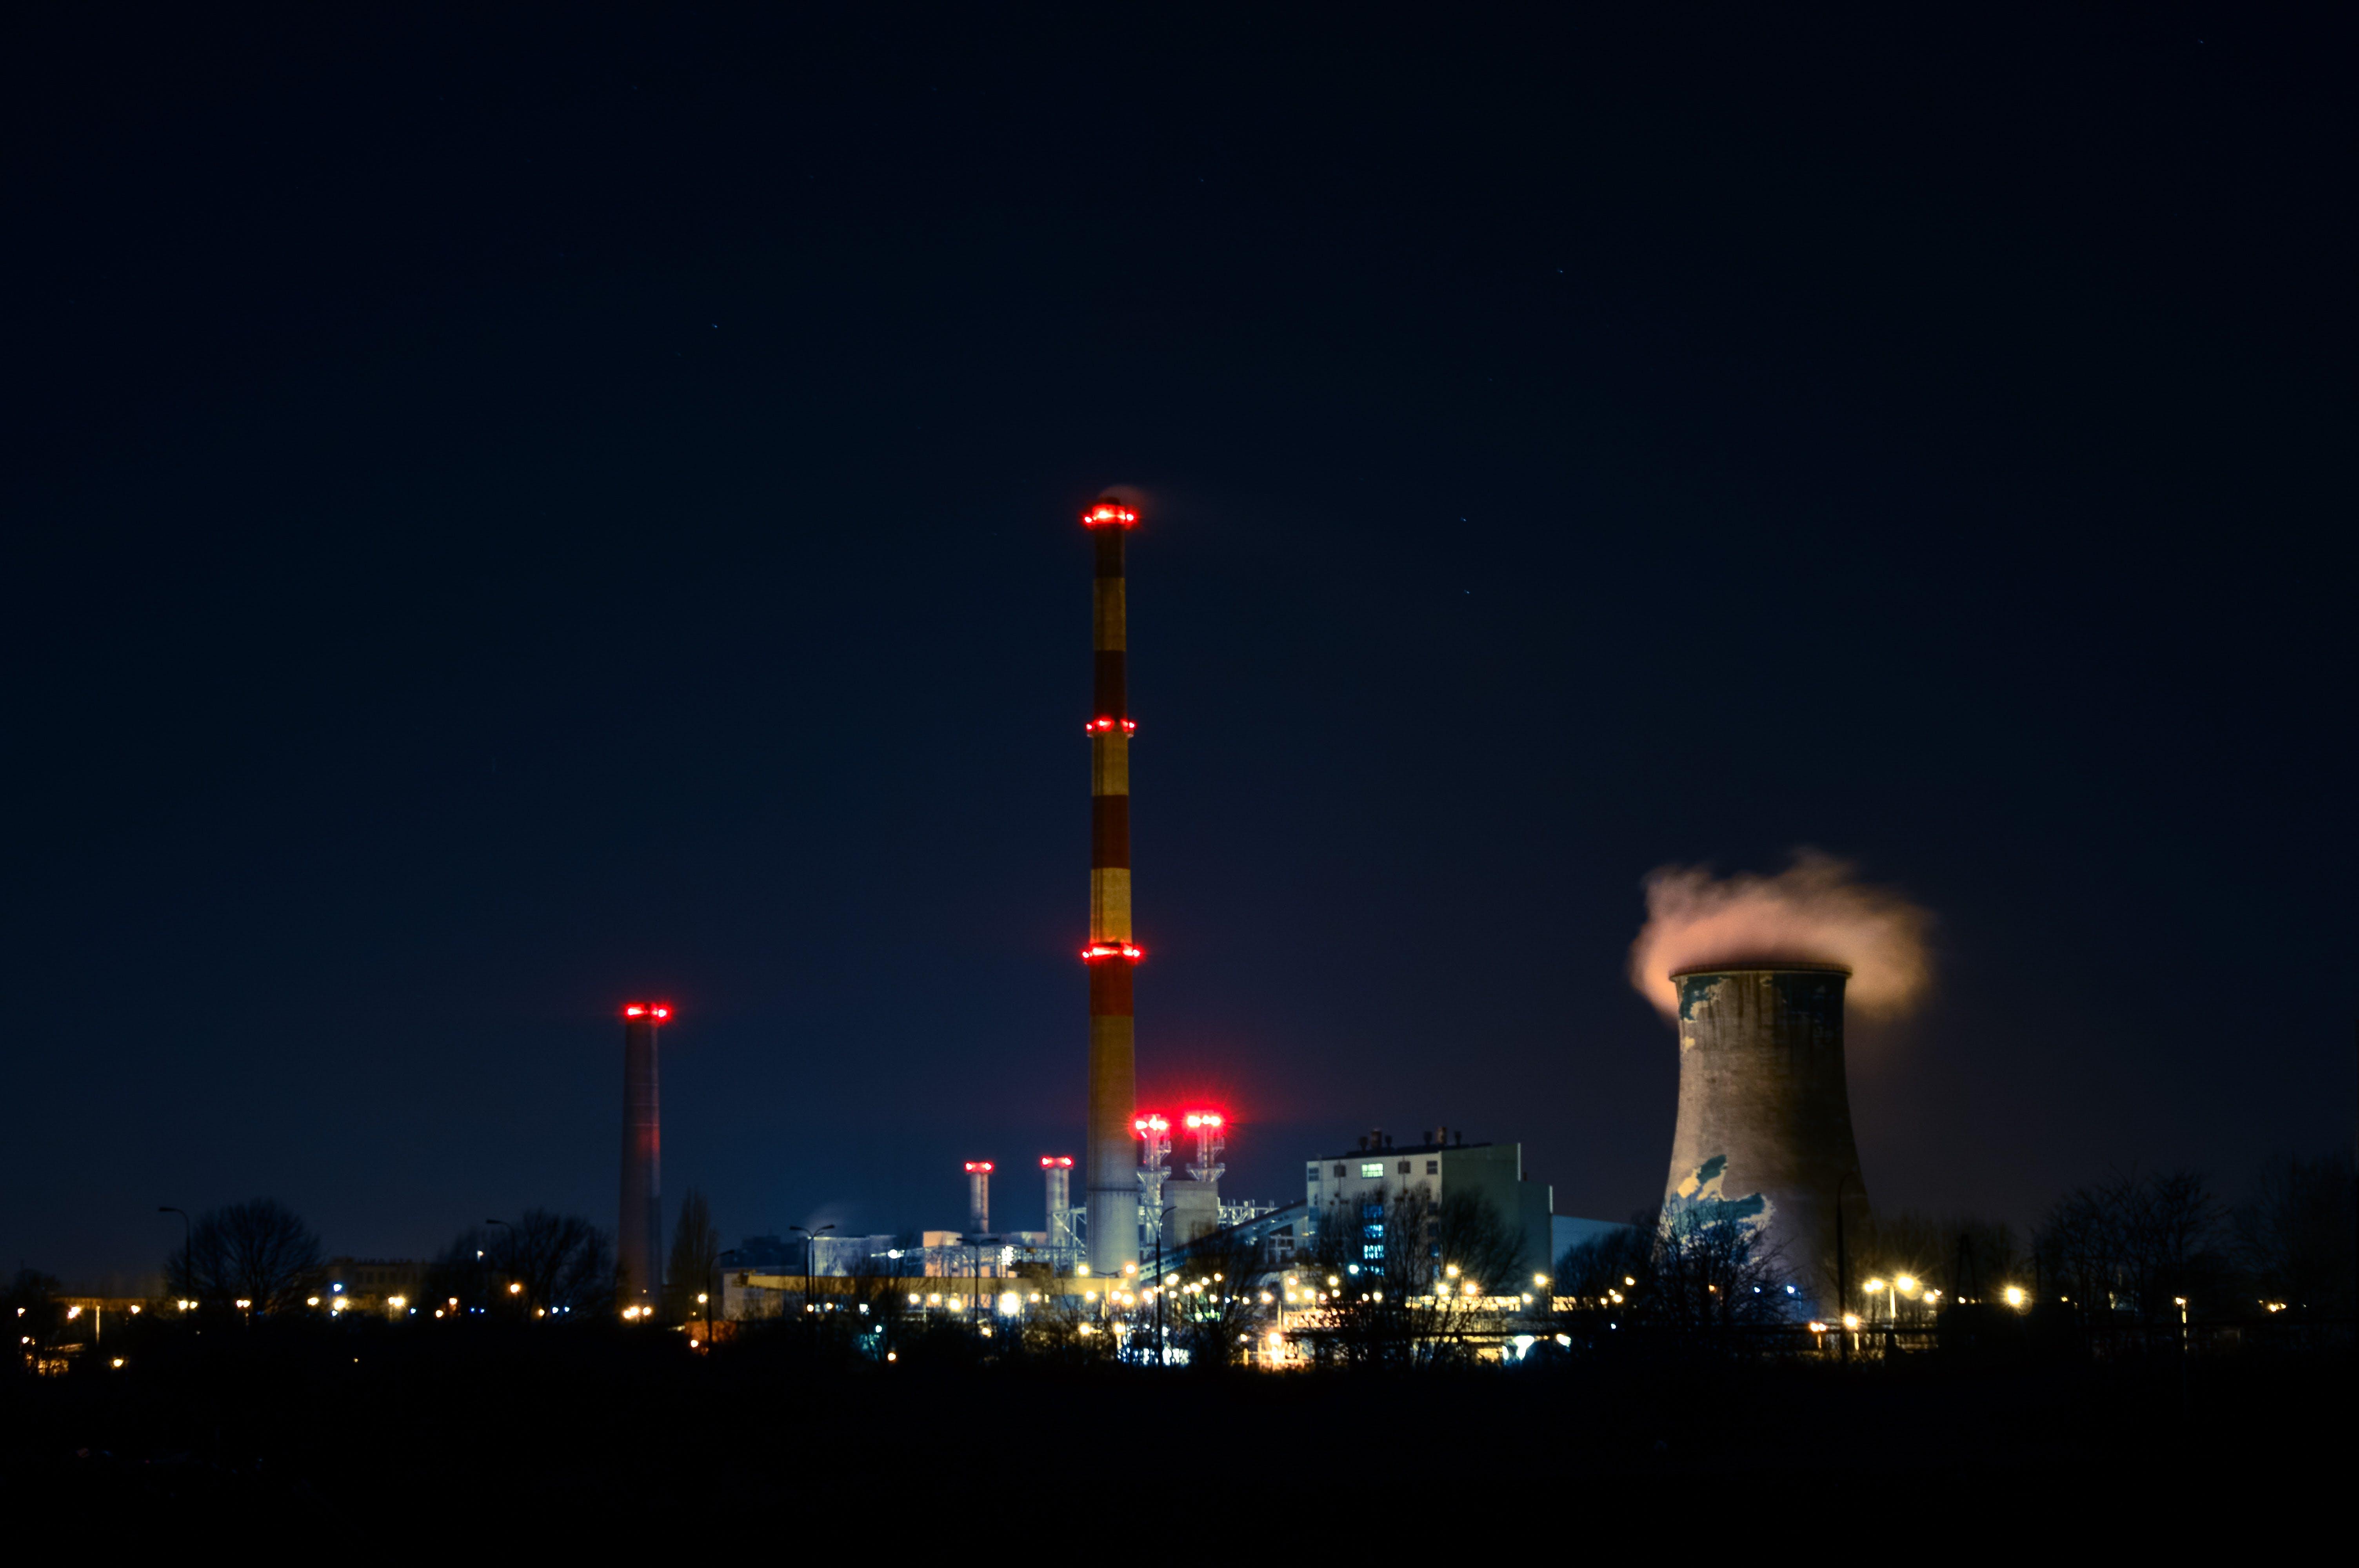 Grey Power Plant